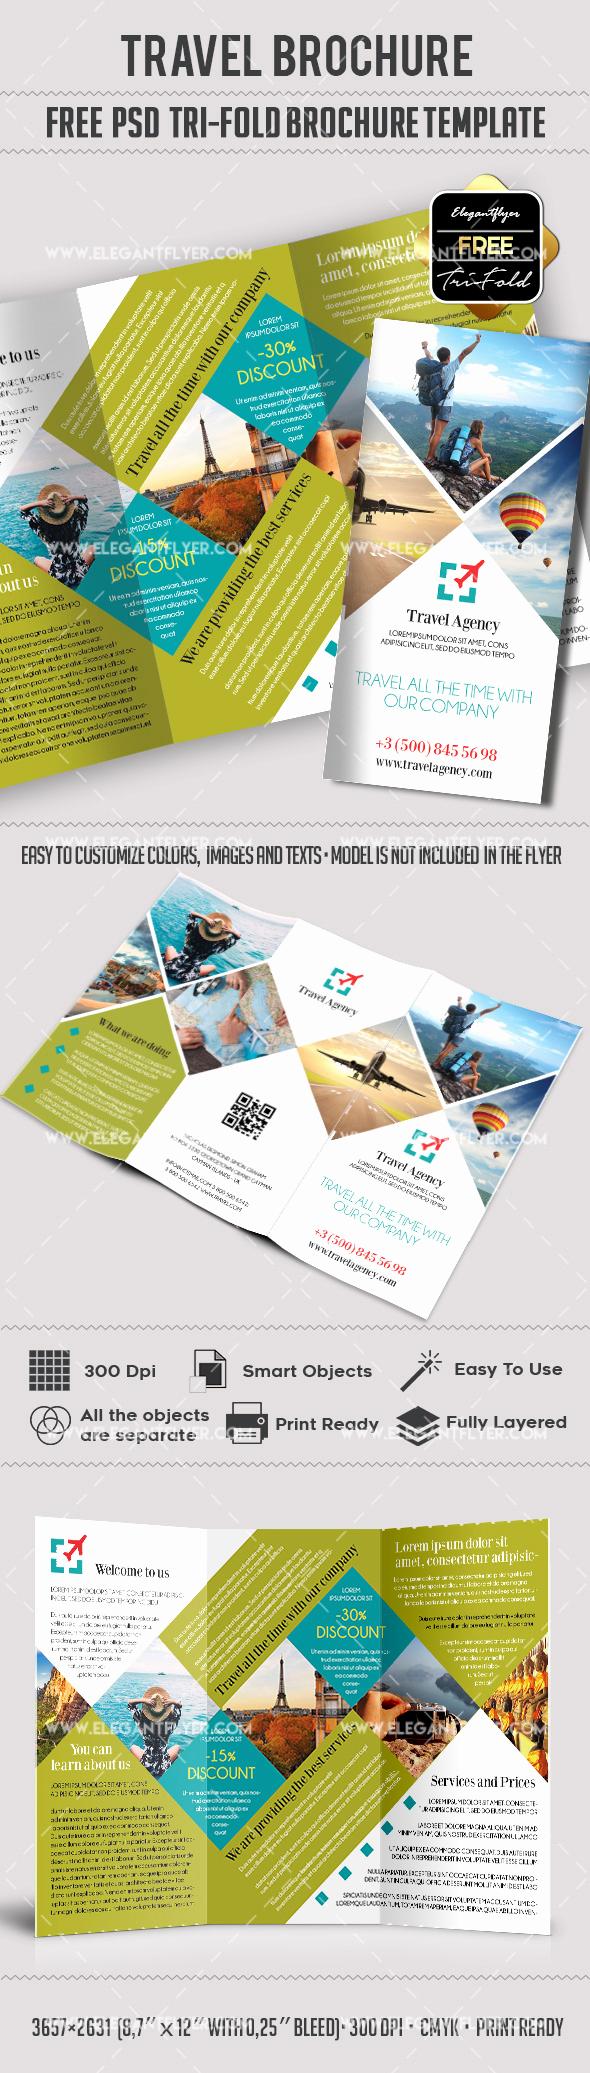 Tri Fold Brochure Template Psd Best Of Travel – Free Psd Tri Fold Psd Brochure Template – by